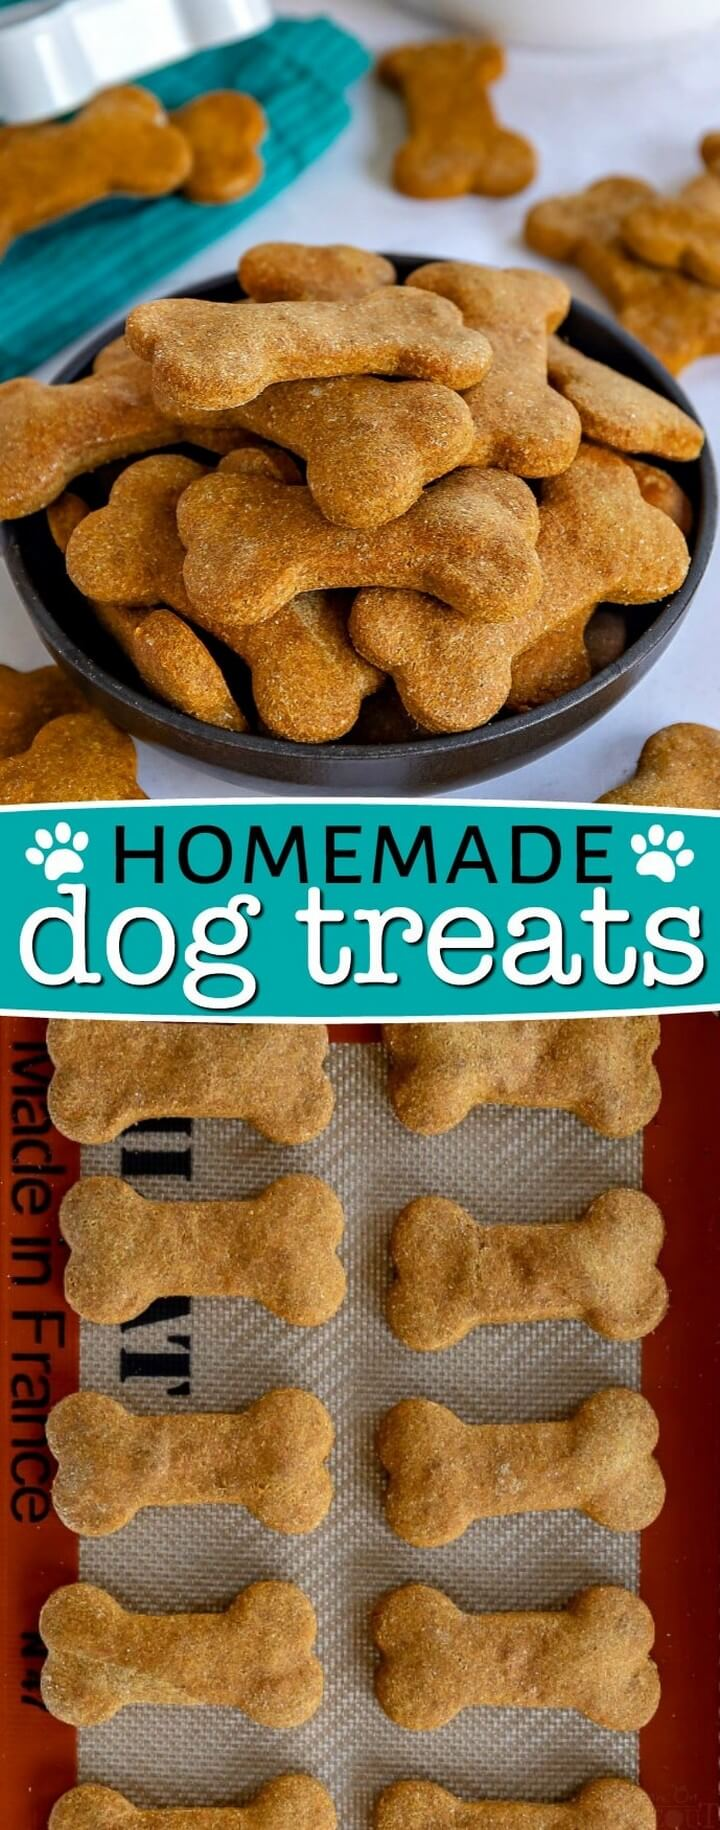 Homemade Dog Treats DIY